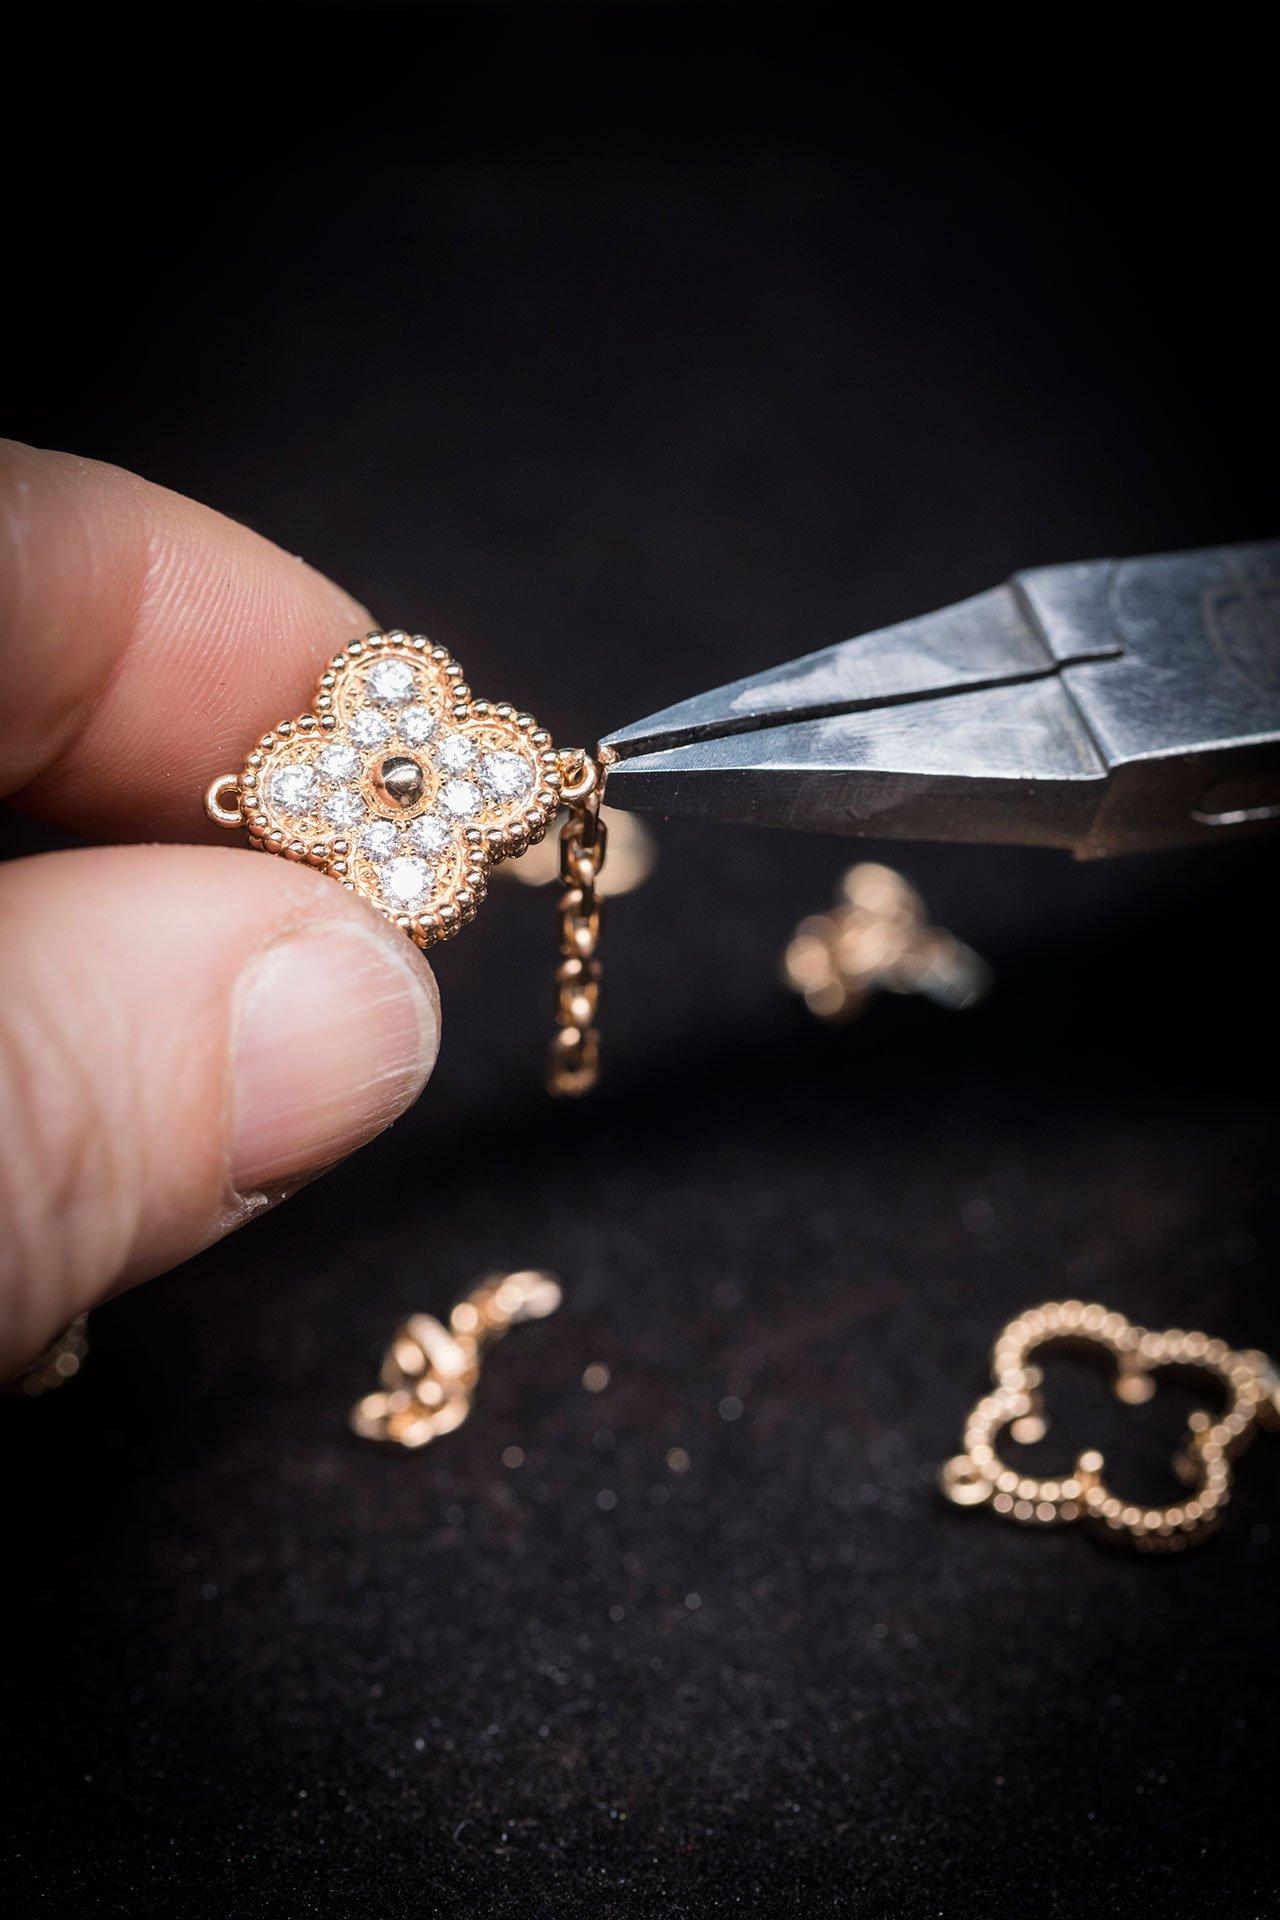 VanCleef&Arpels'making ofAlhambra long necklace. Photo ©VanCleef&Arpels.